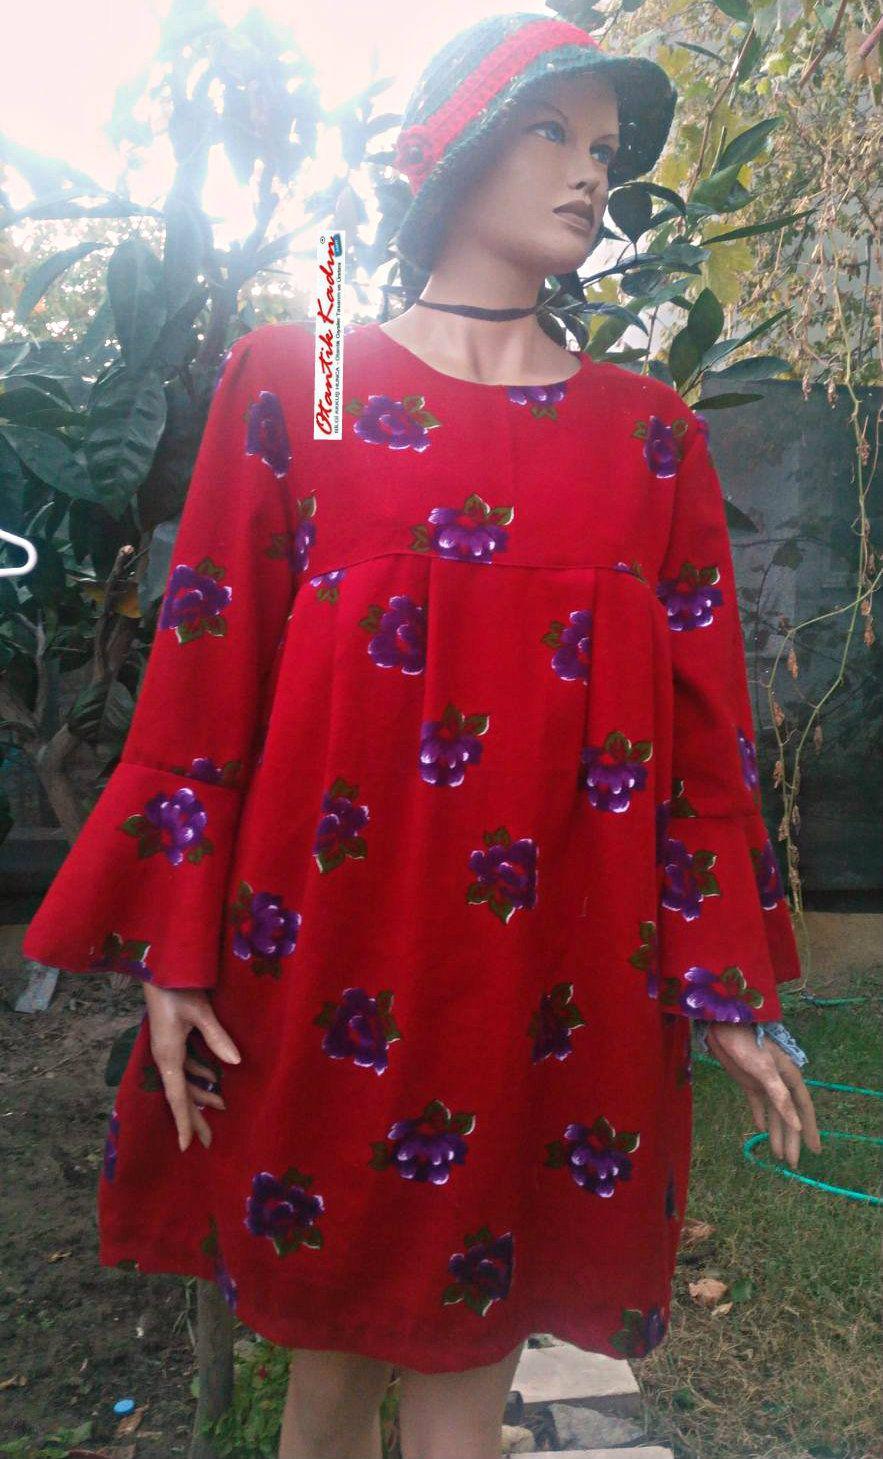 Volan Kol Kirmizi Pazen Elbise 031117 Jpg 883 1 459 Piksel The Dress Elbiseler Elbise